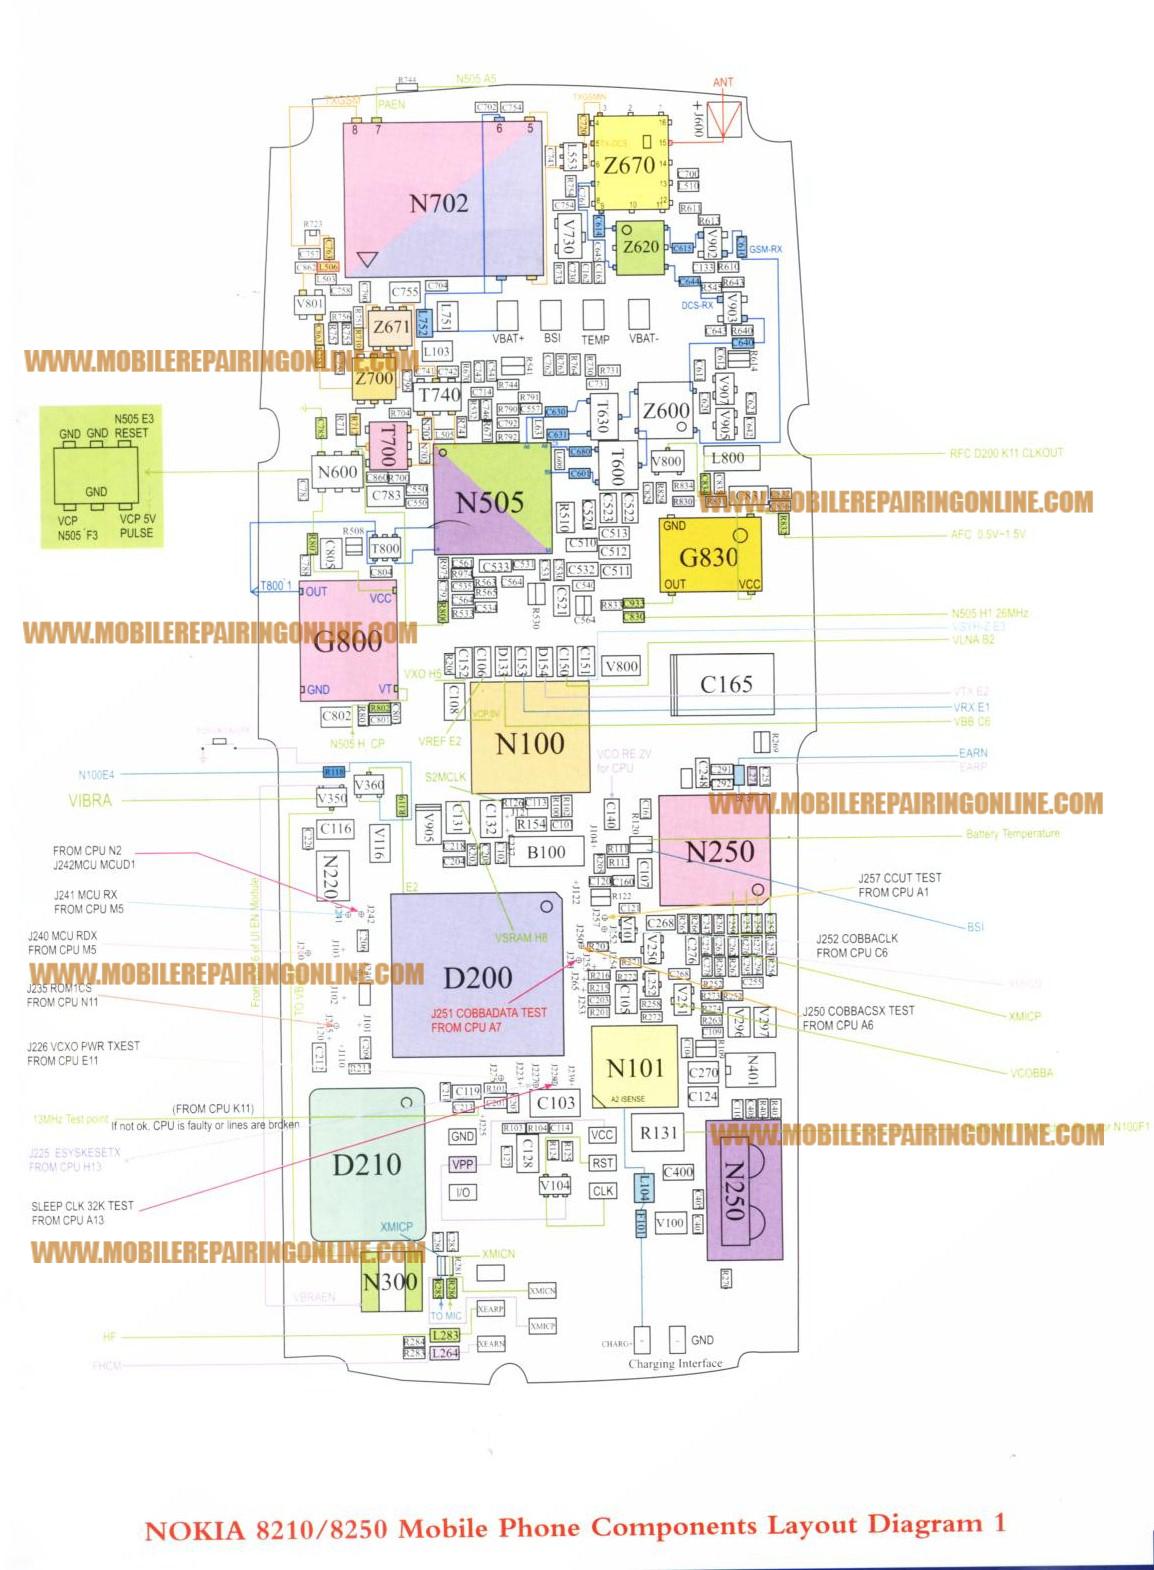 Admirable Schematic Diagram For Nokia Mobile Phones Mobilerepairingonline Wiring Cloud Xortanetembamohammedshrineorg